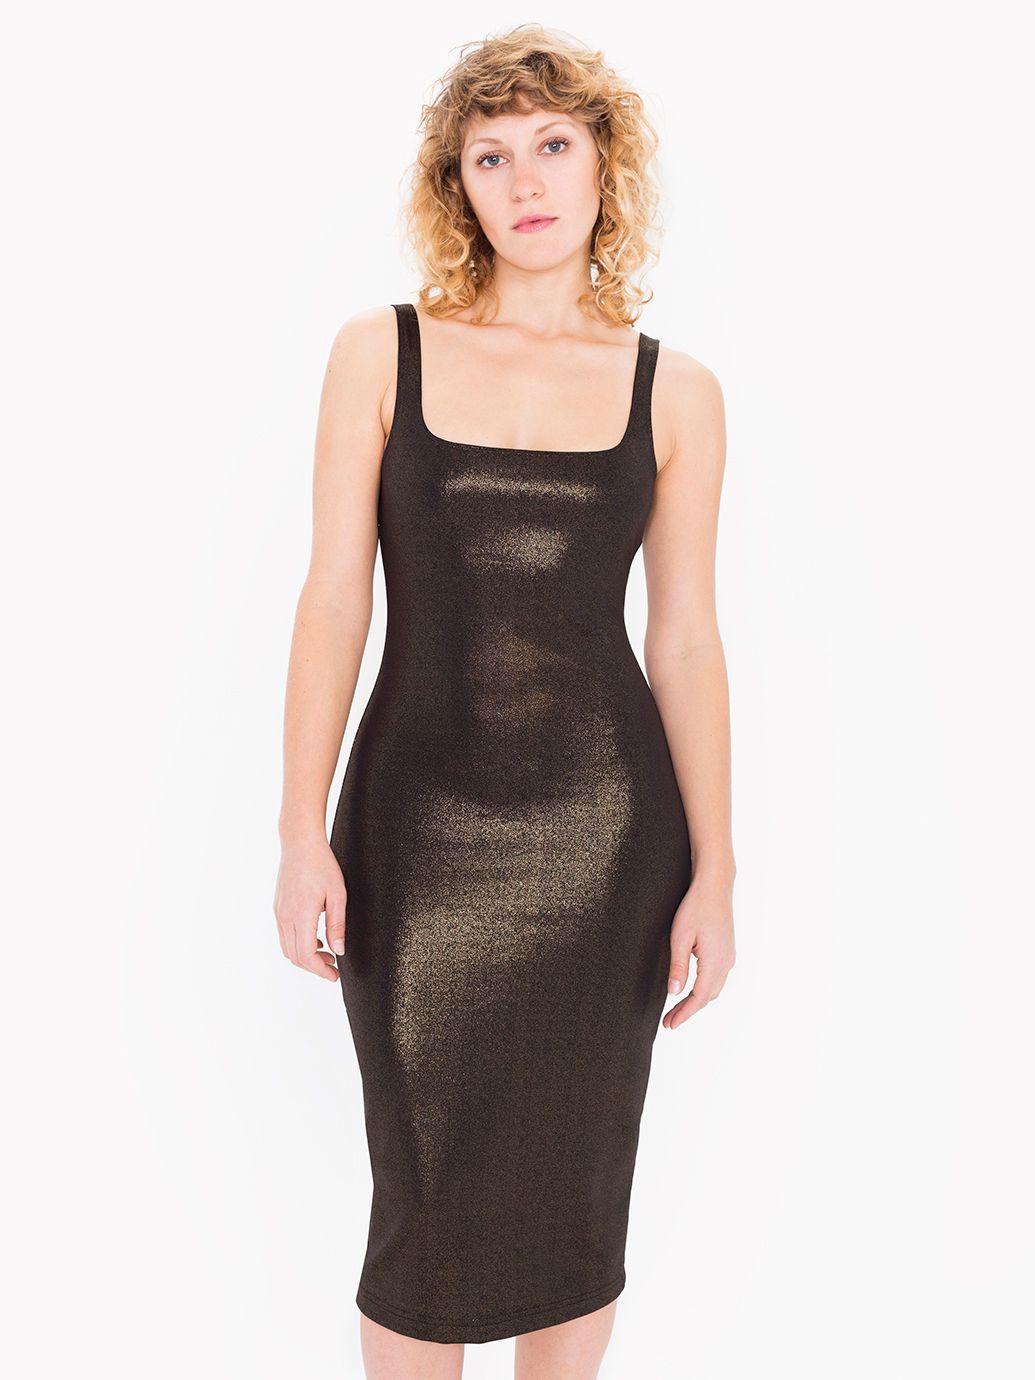 Gold dress american apparel 5398